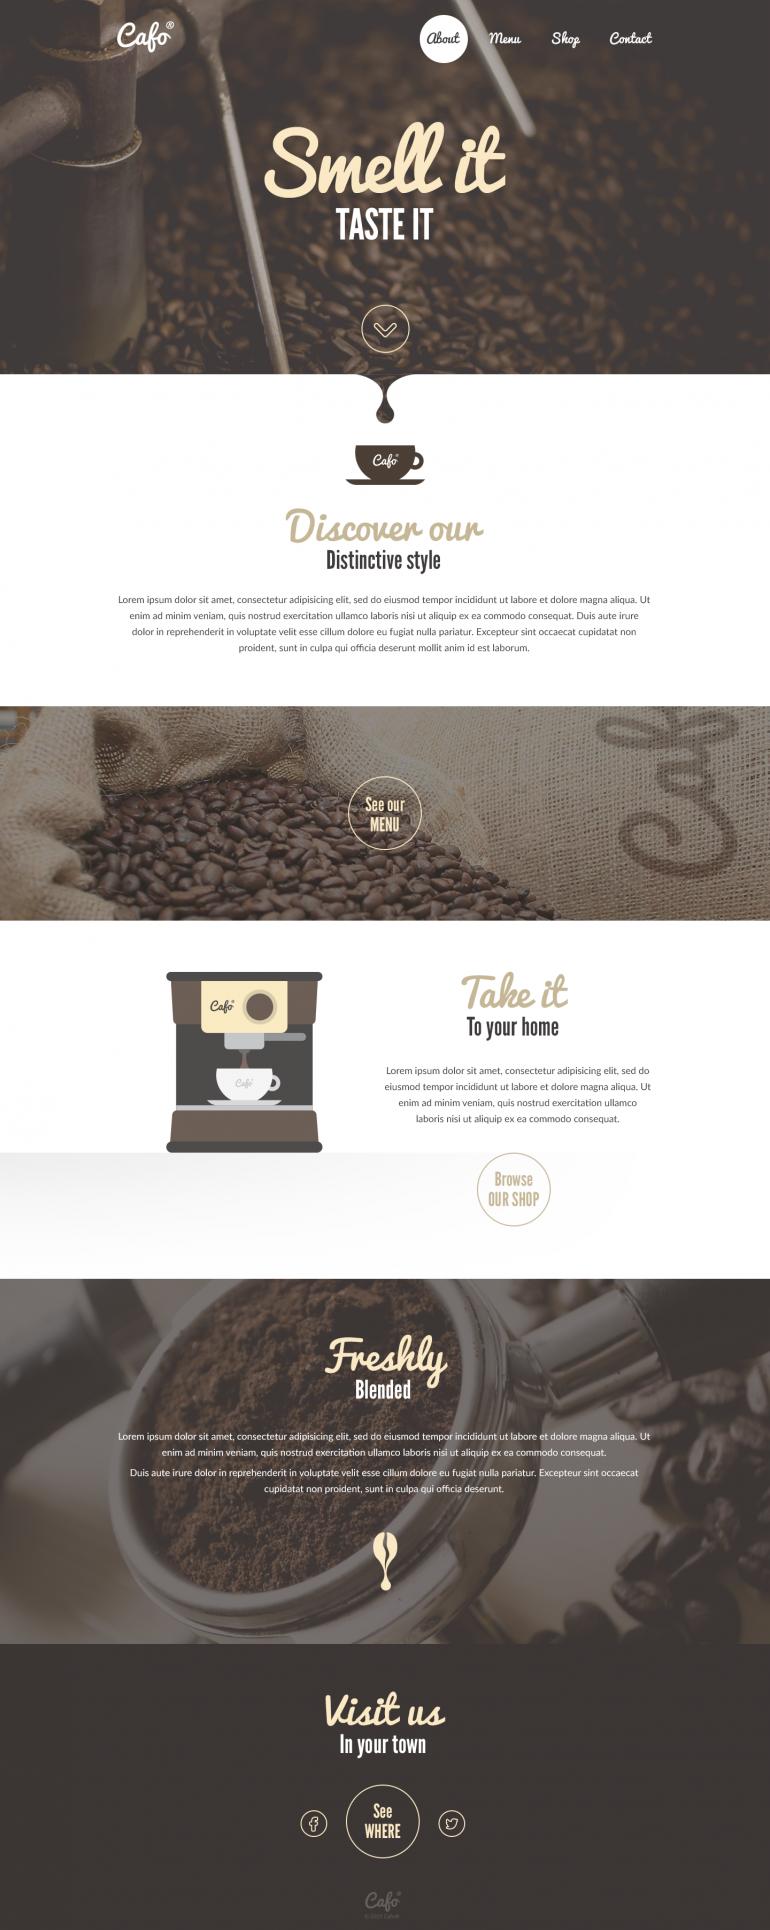 Smell it – Coffee Shop Landingpage Idea.